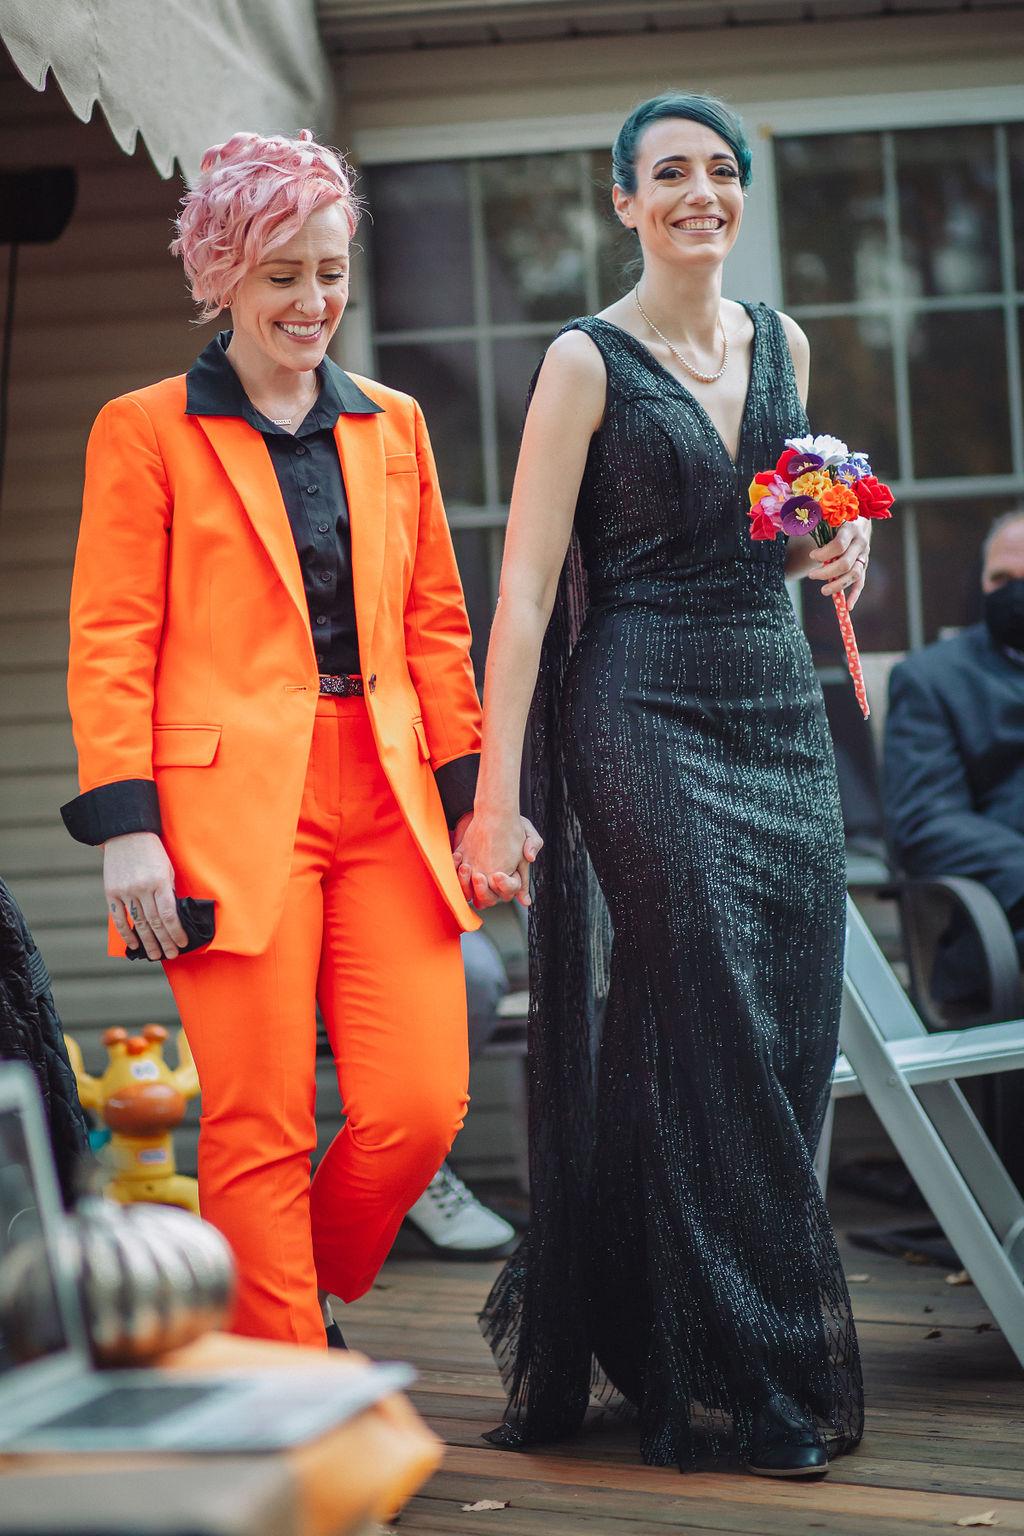 Sarah Foley photography lesbian gay queer lgbtqia+ Reeding Pennsylvania small COVID-19 wedding marrage Dancing With Her (4)